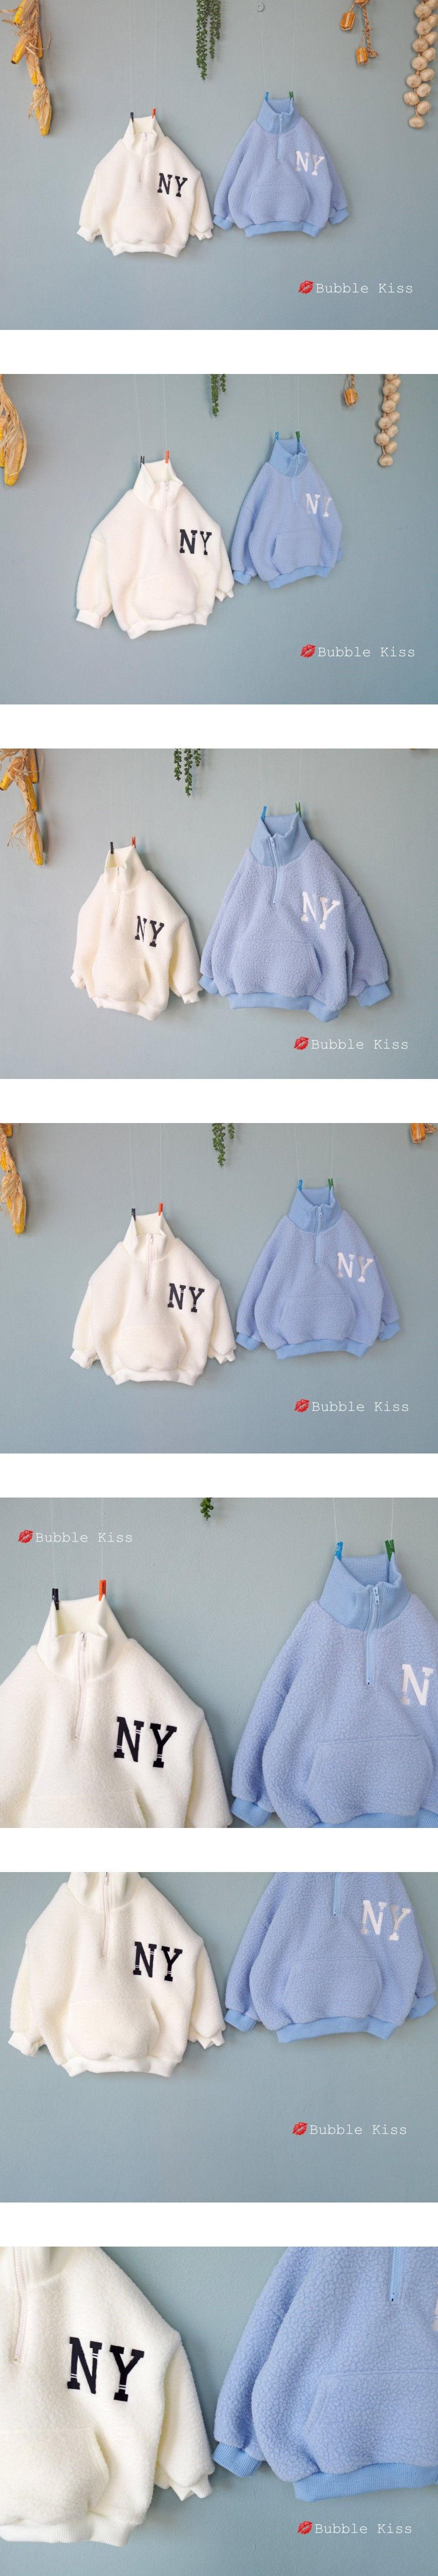 BUBBLE KISS - Korean Children Fashion - #Kfashion4kids - NY Dumble Pullover - 4